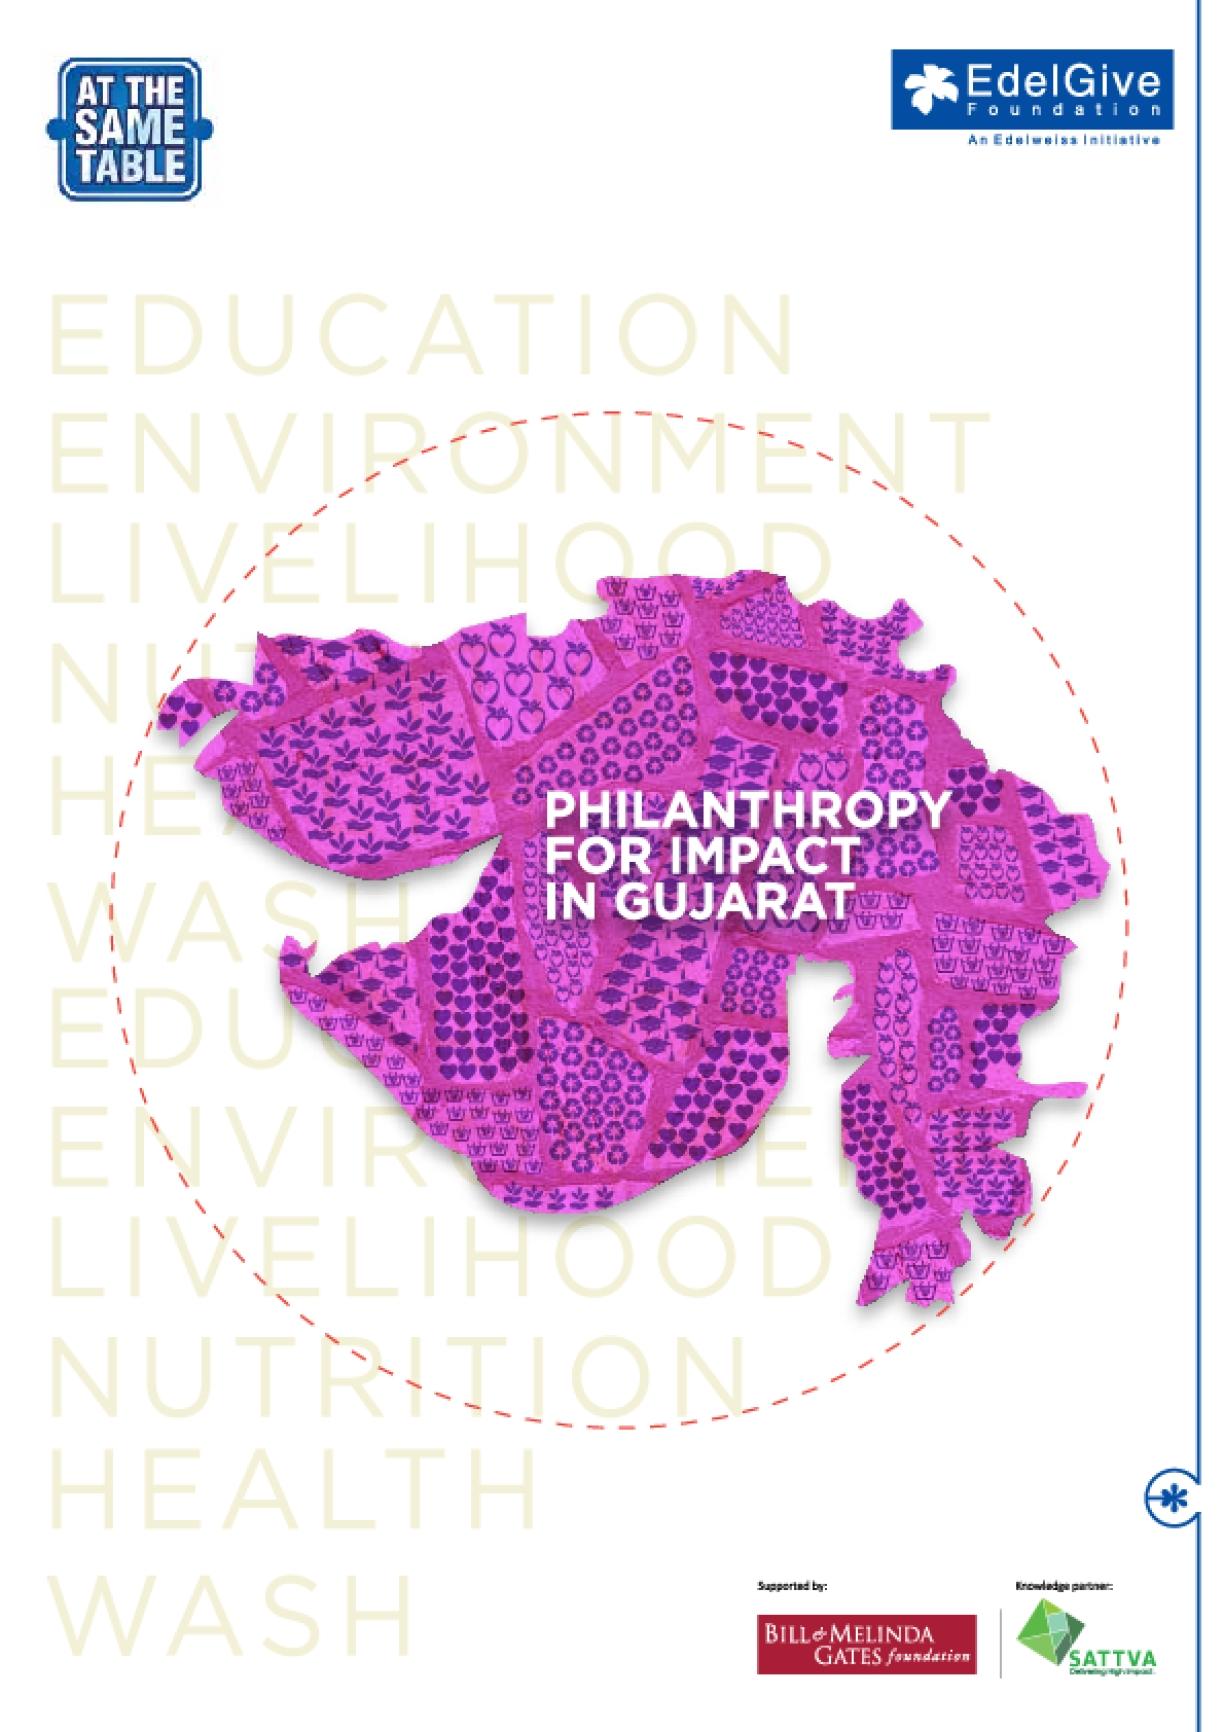 Philanthropy for Impact in Gujarat